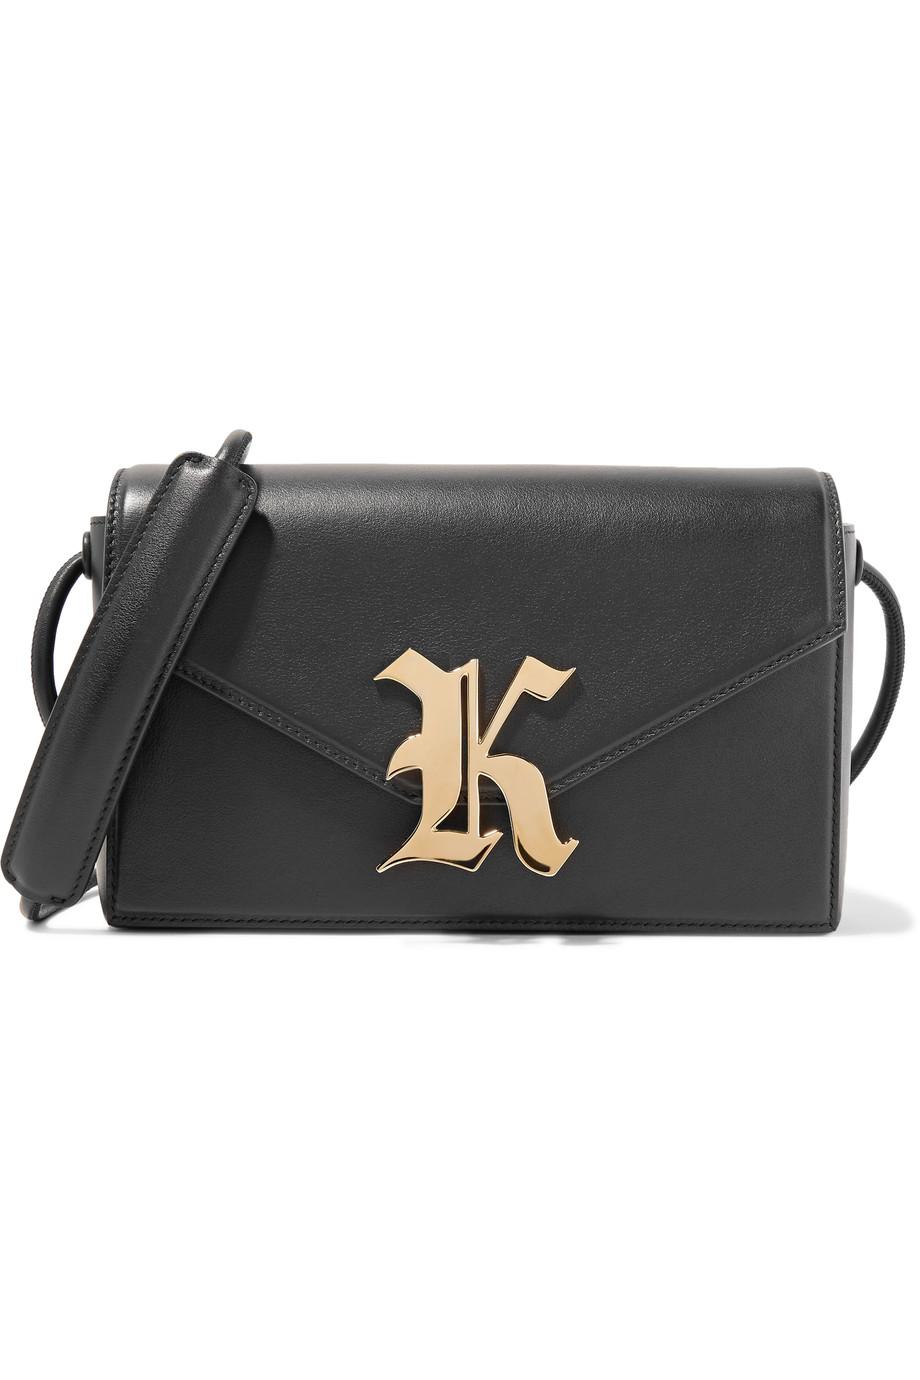 Christopher Kane  Gothic K Leather Bag  ($995)